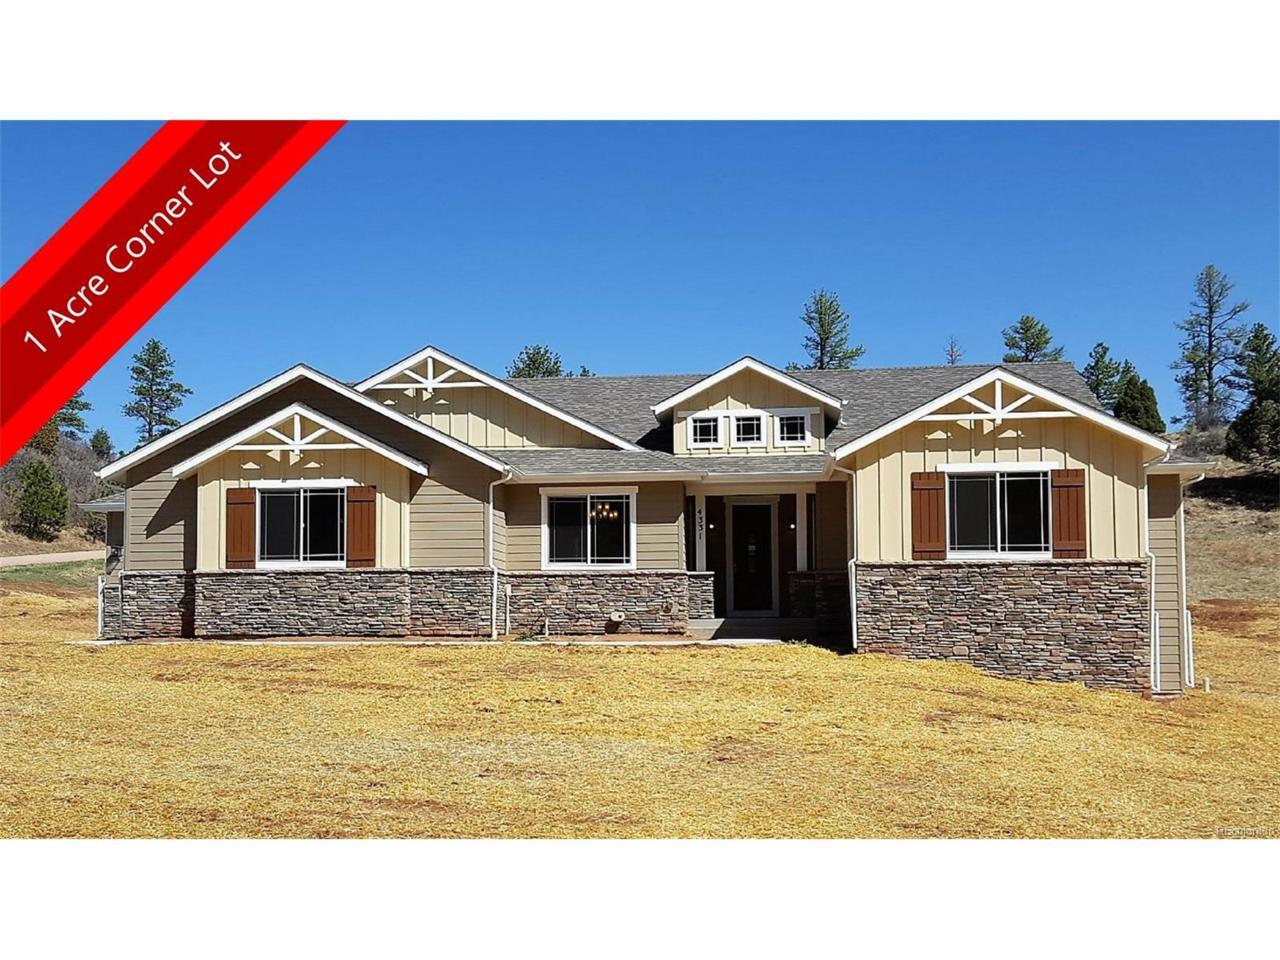 4331 Mohawk Drive, Larkspur, CO 80118 (MLS #7008149) :: 8z Real Estate